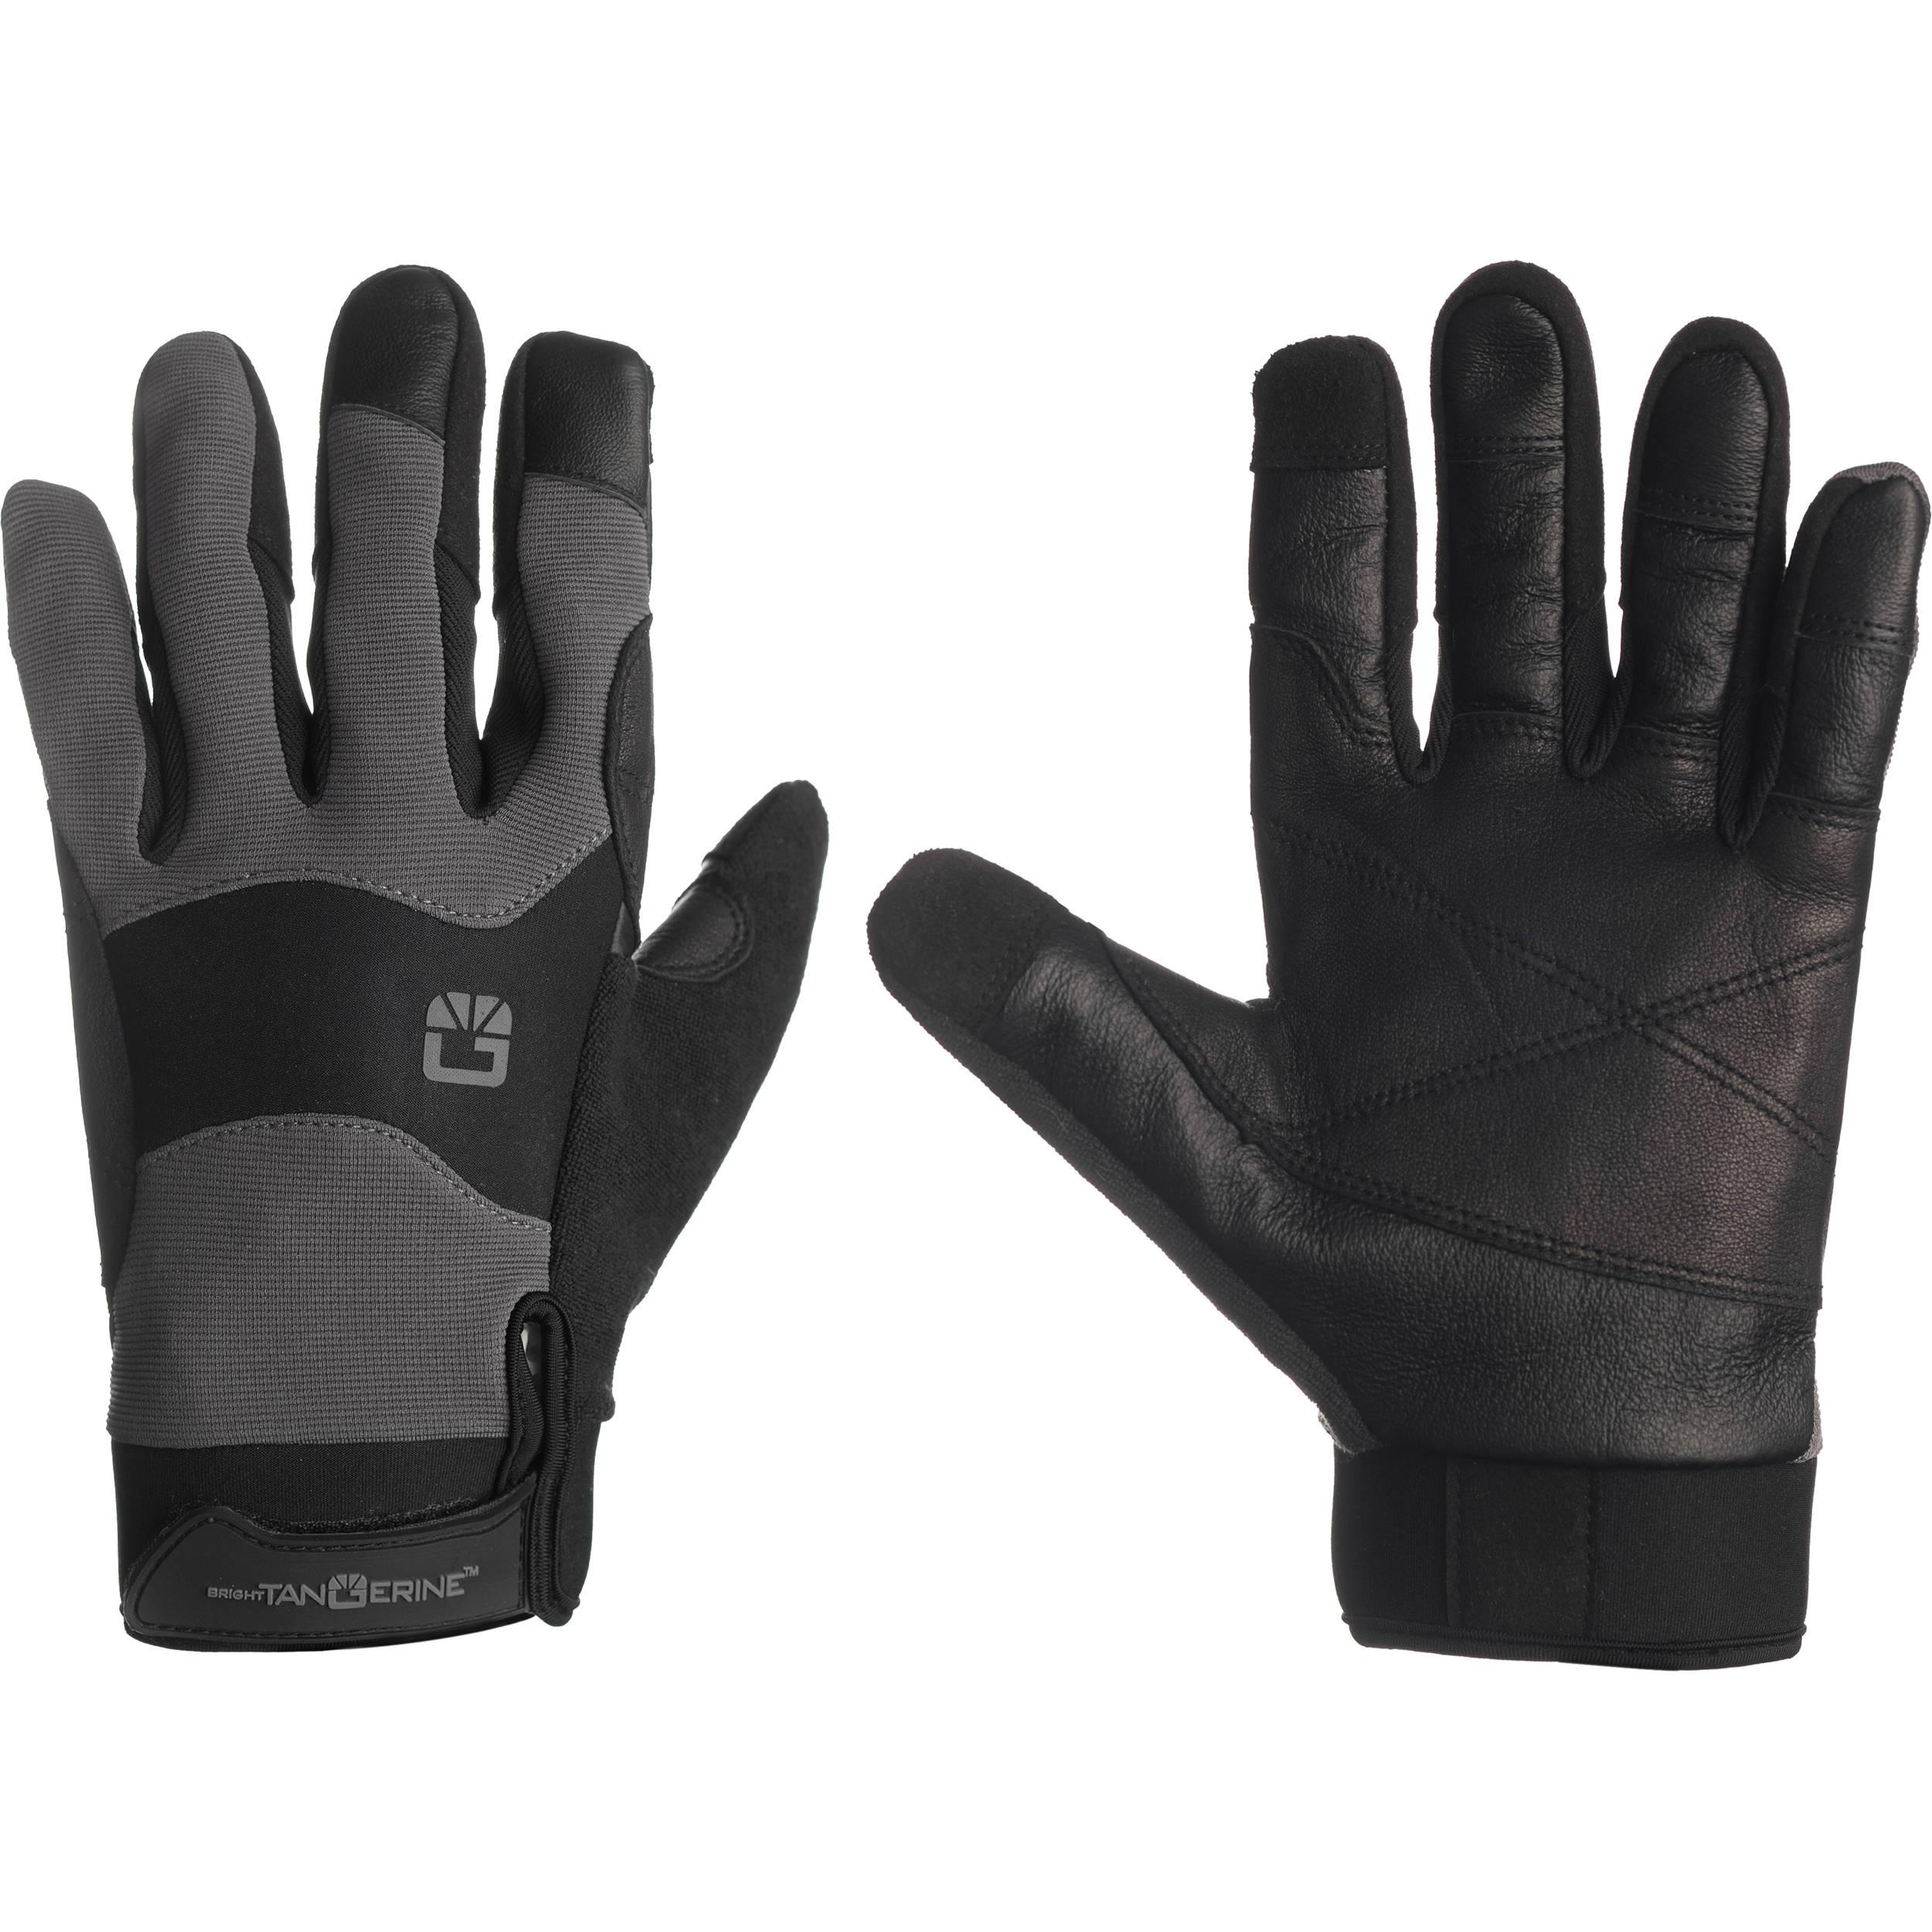 b1eb28908e0e Bright Tangerine ExoSkin Leather Armour Gloves (L) B1300.1006